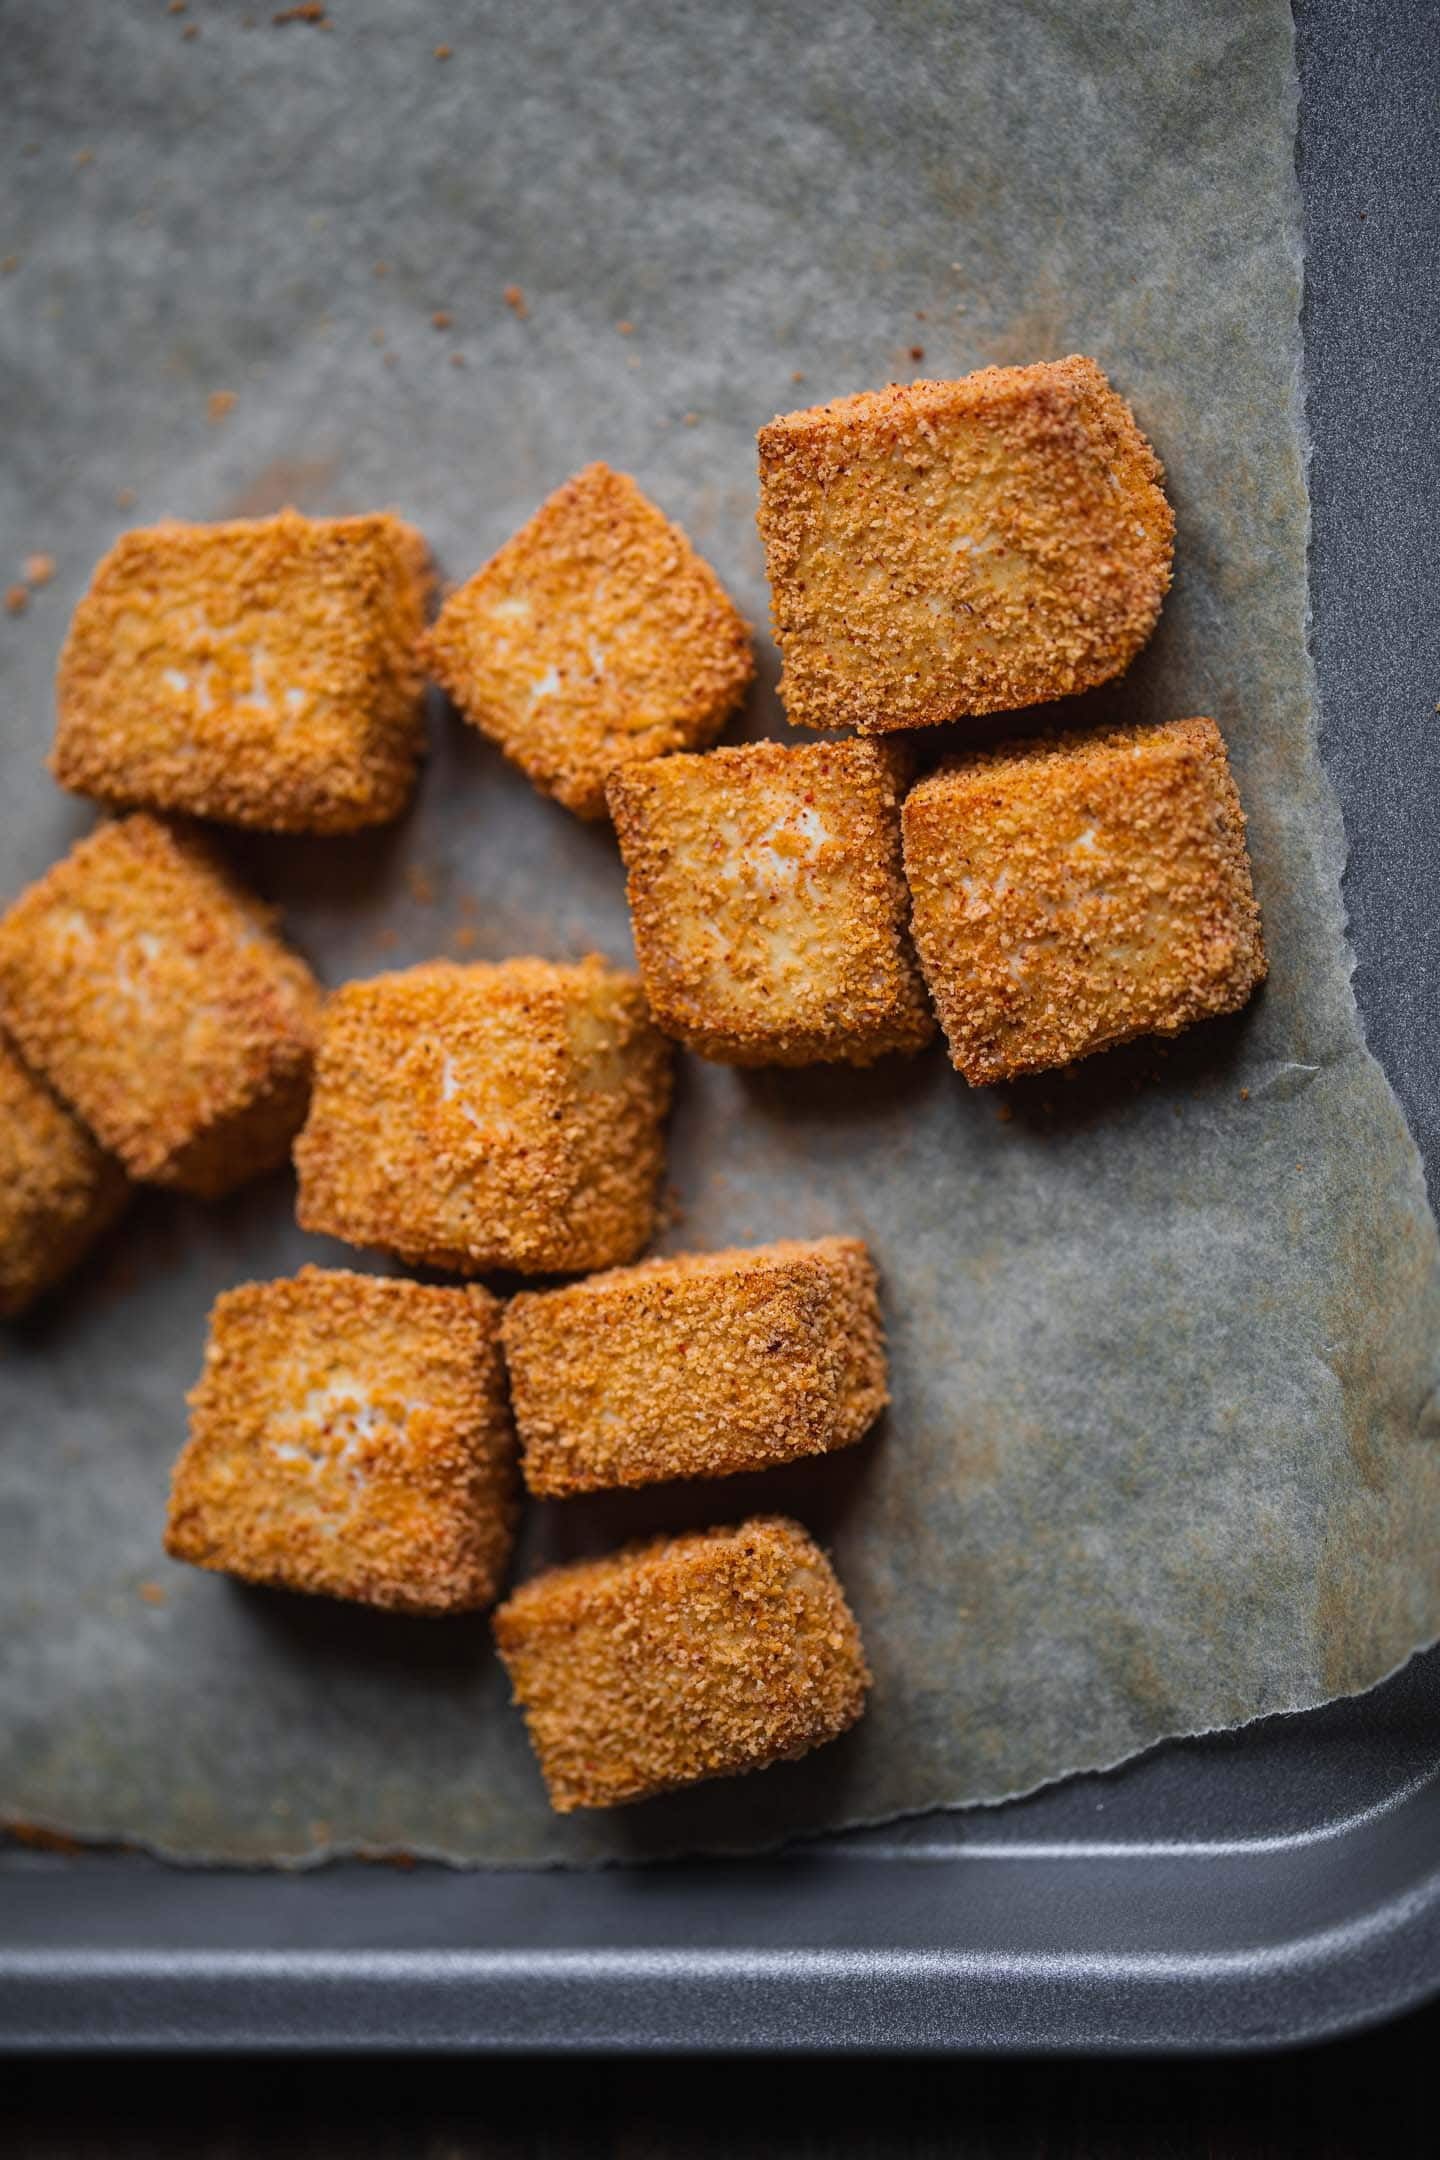 Baked crispy tofu on a baking tray